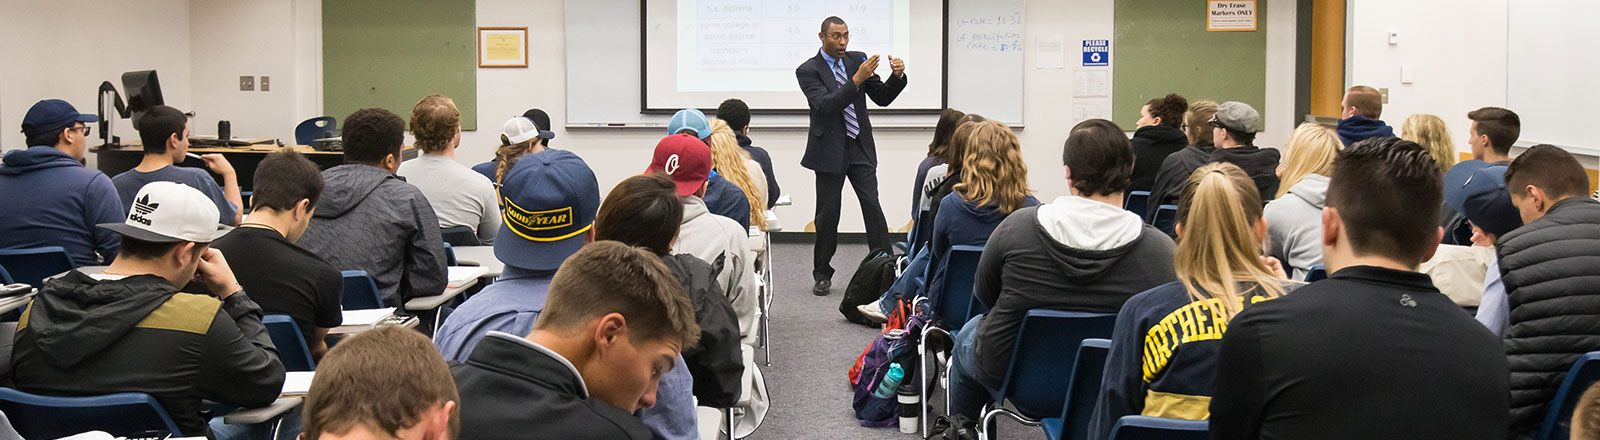 Economics class listening to professor